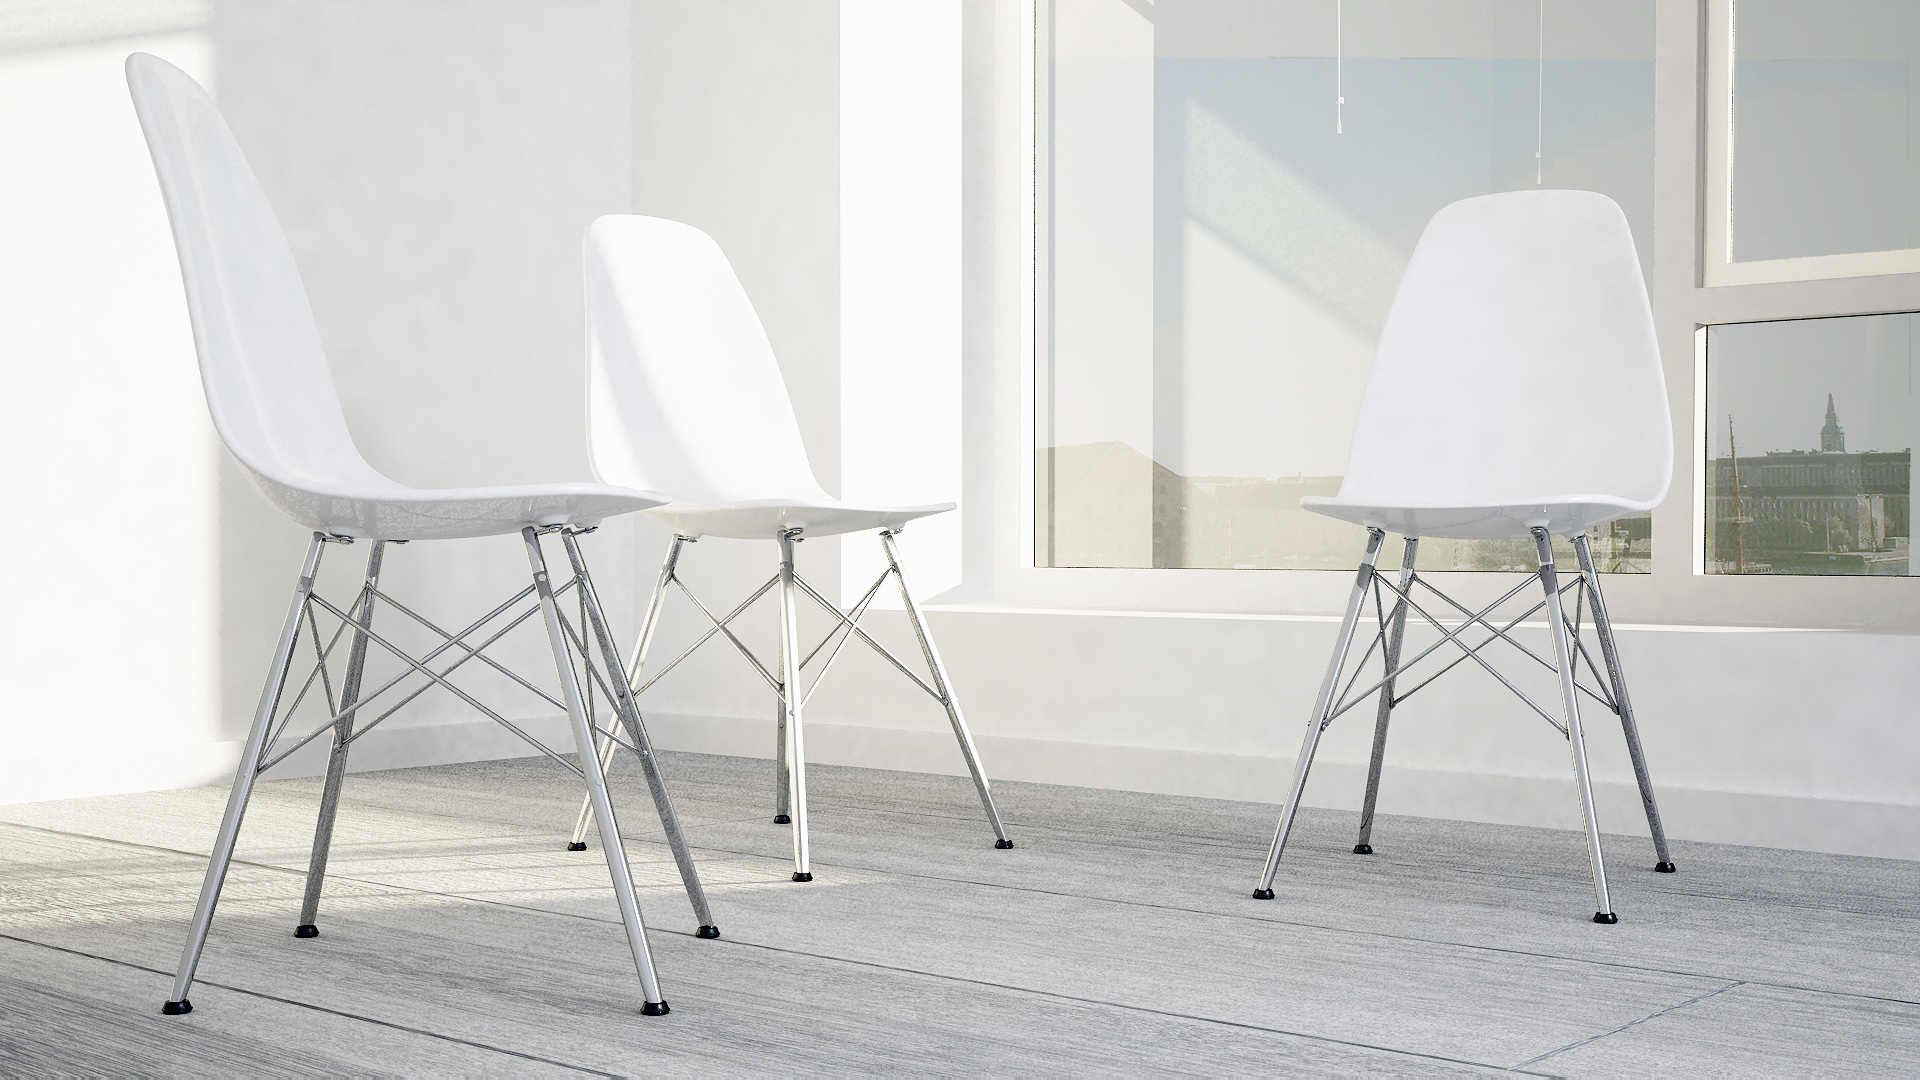 chair design parameters bin bag chairs eames white 3d model max obj 3ds fbx dxf dwg